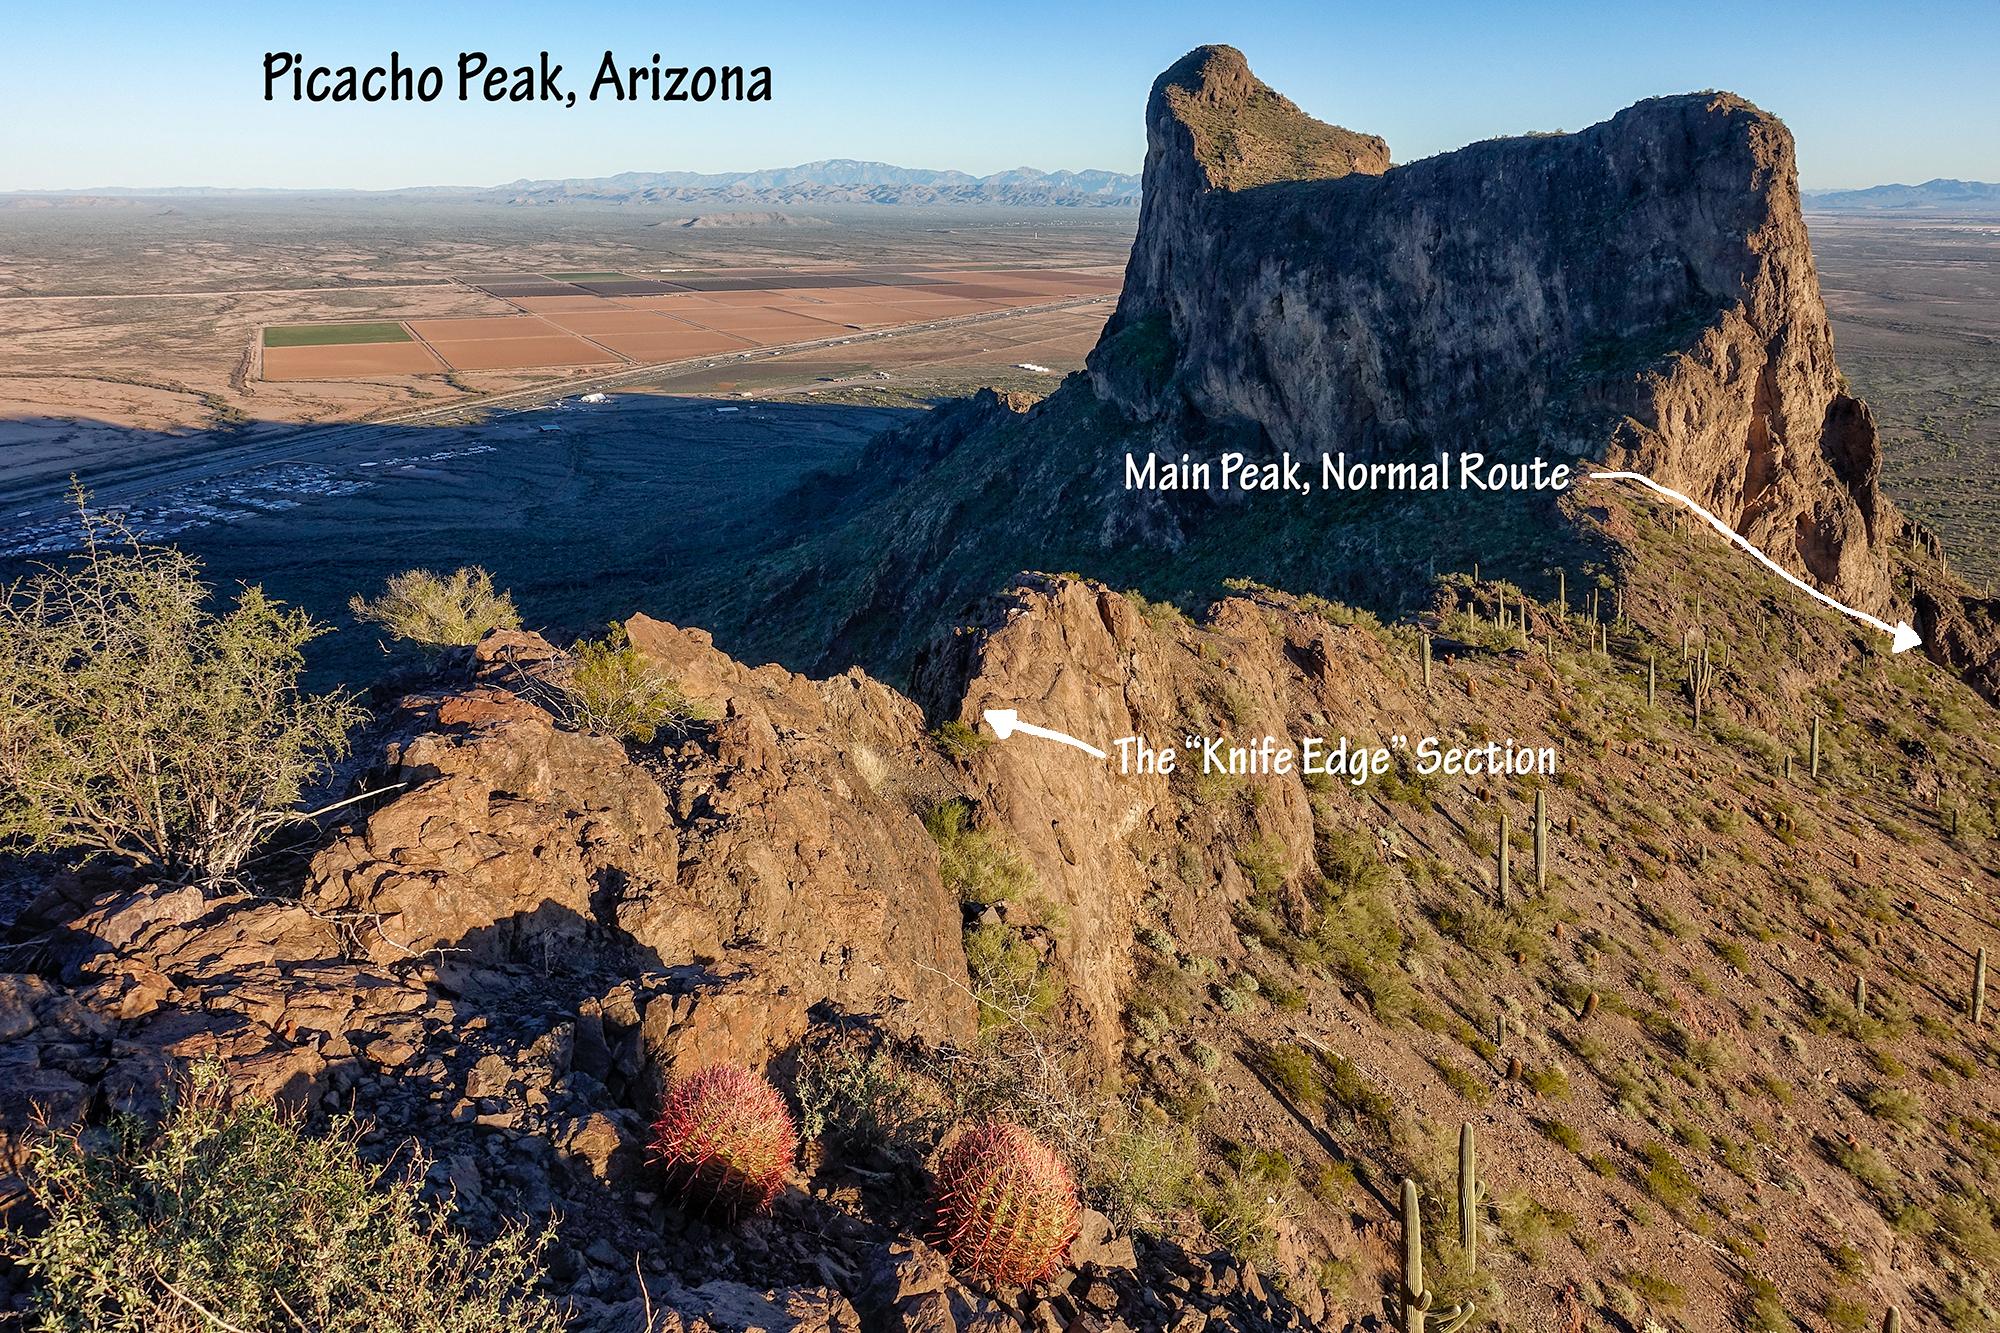 Picacho Peak View, Arizona, 2016